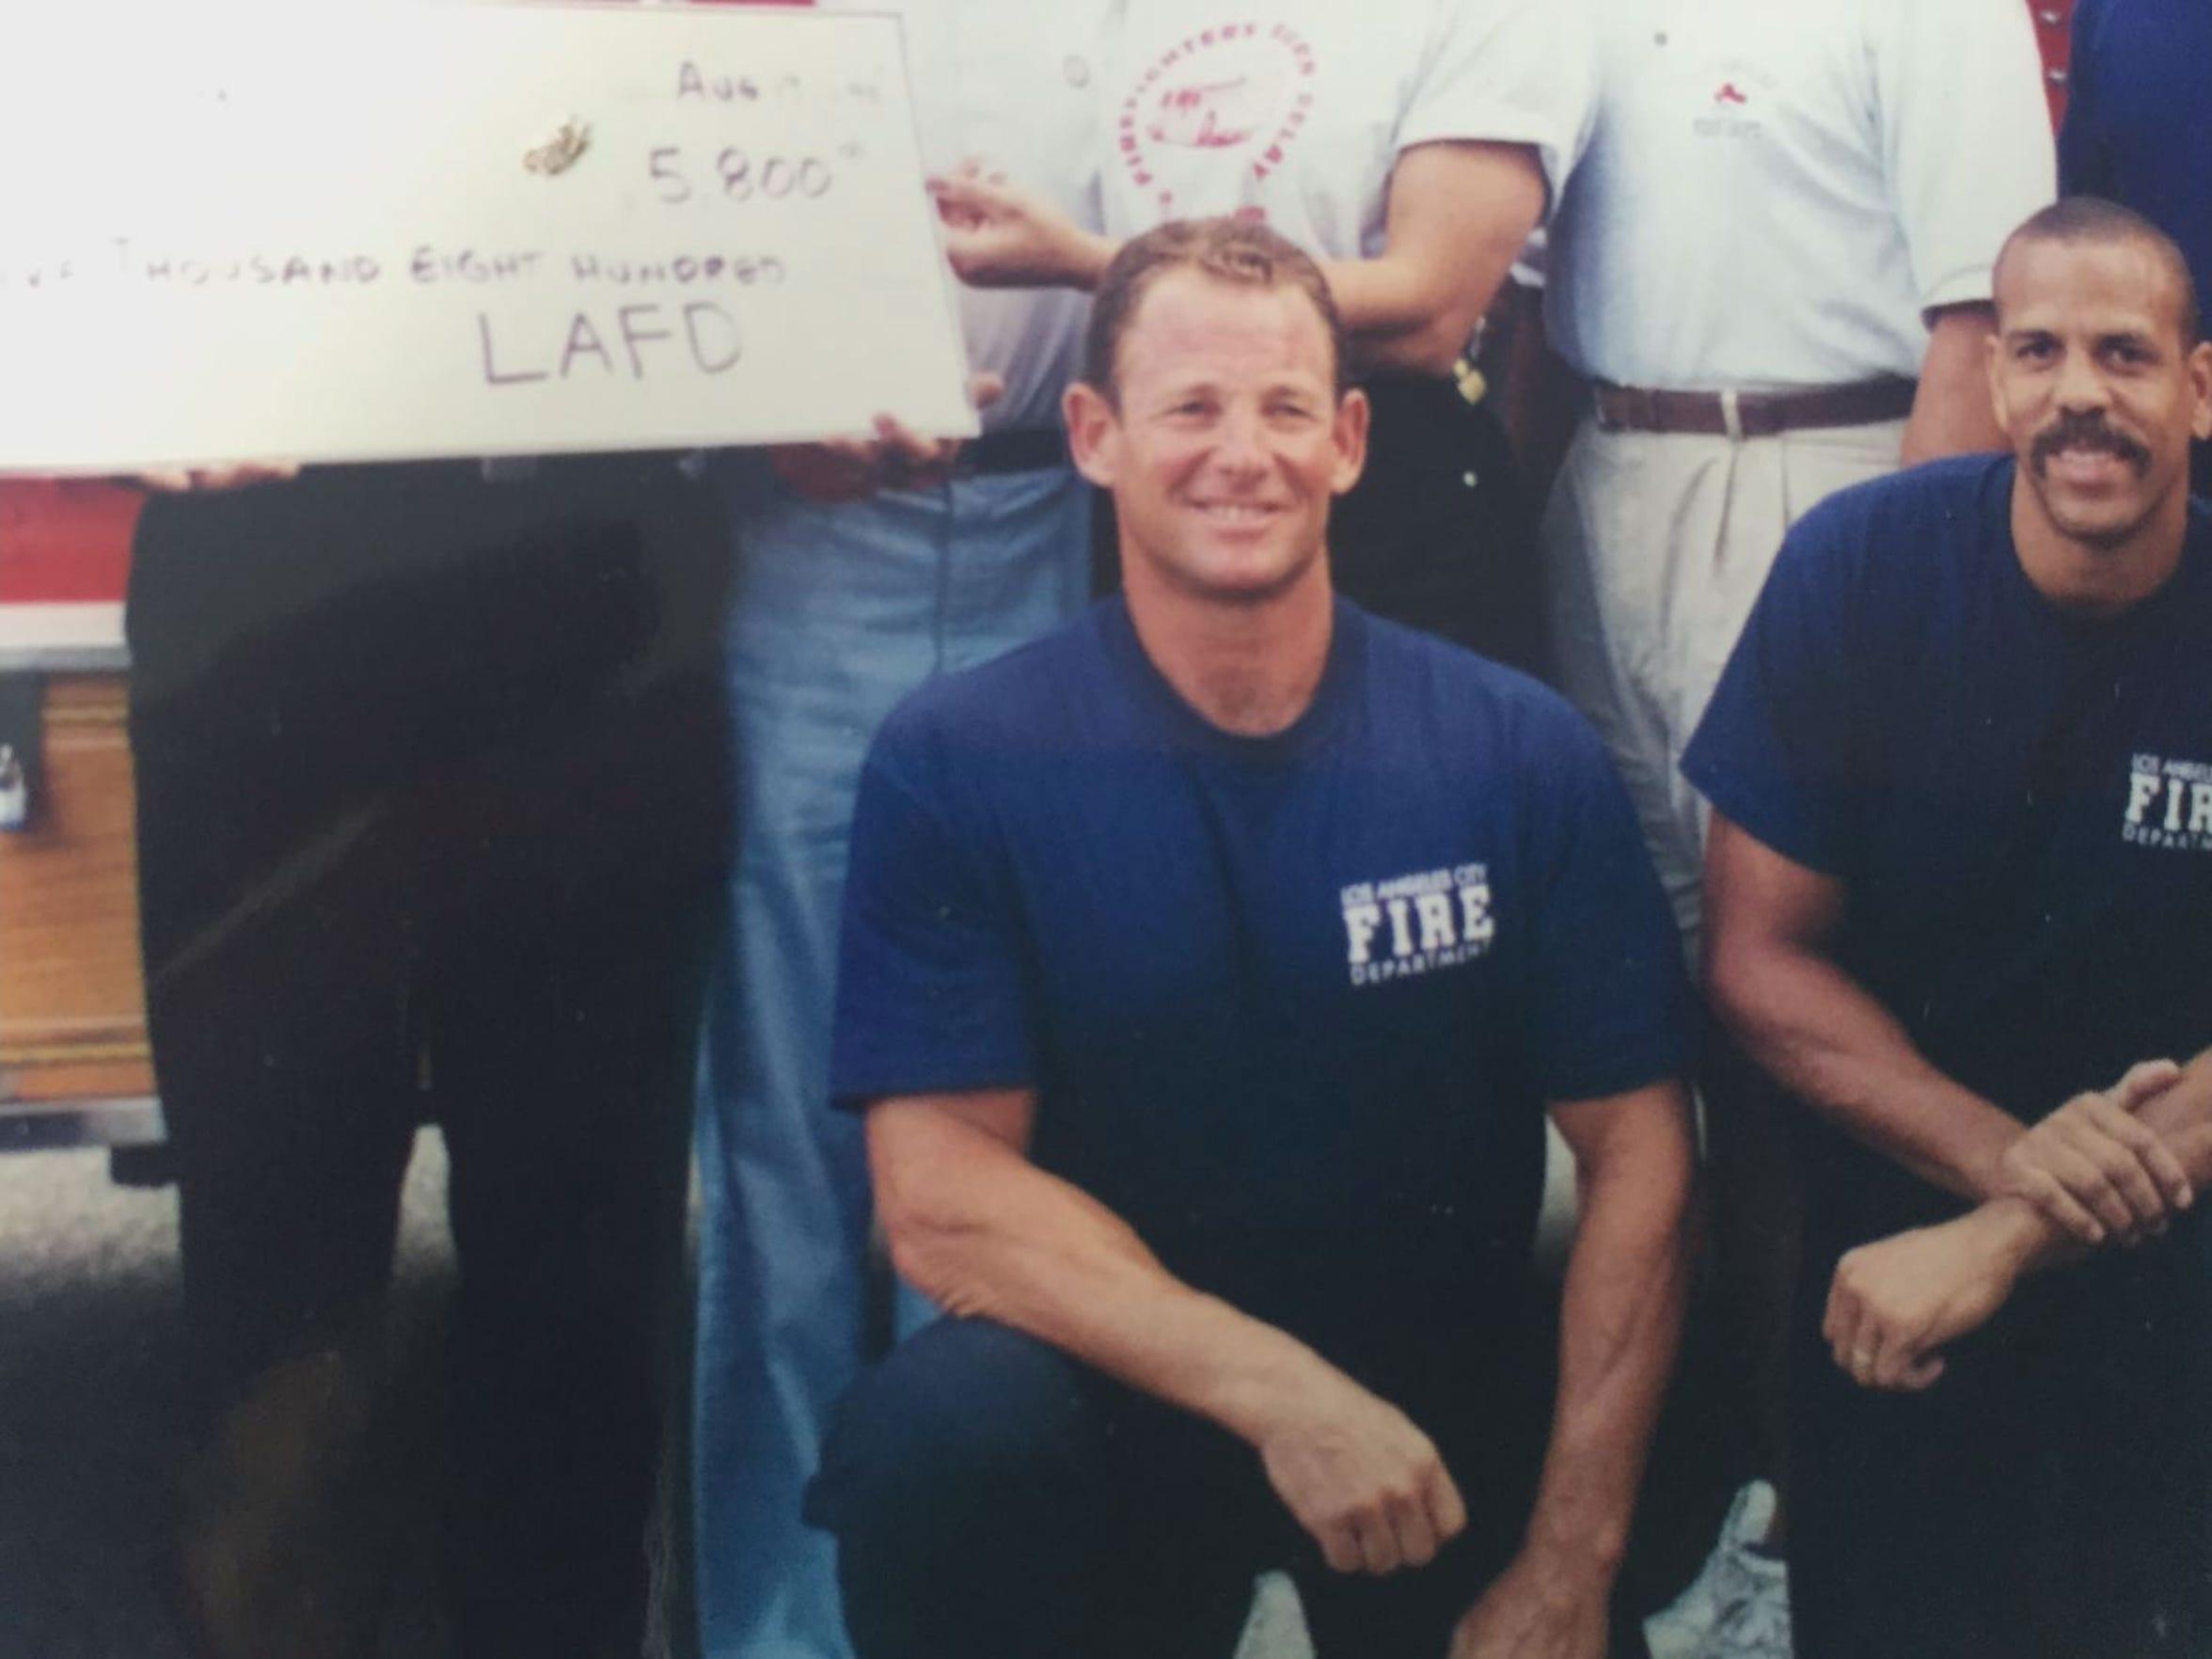 Corey Rose's father - Gary Stameisen